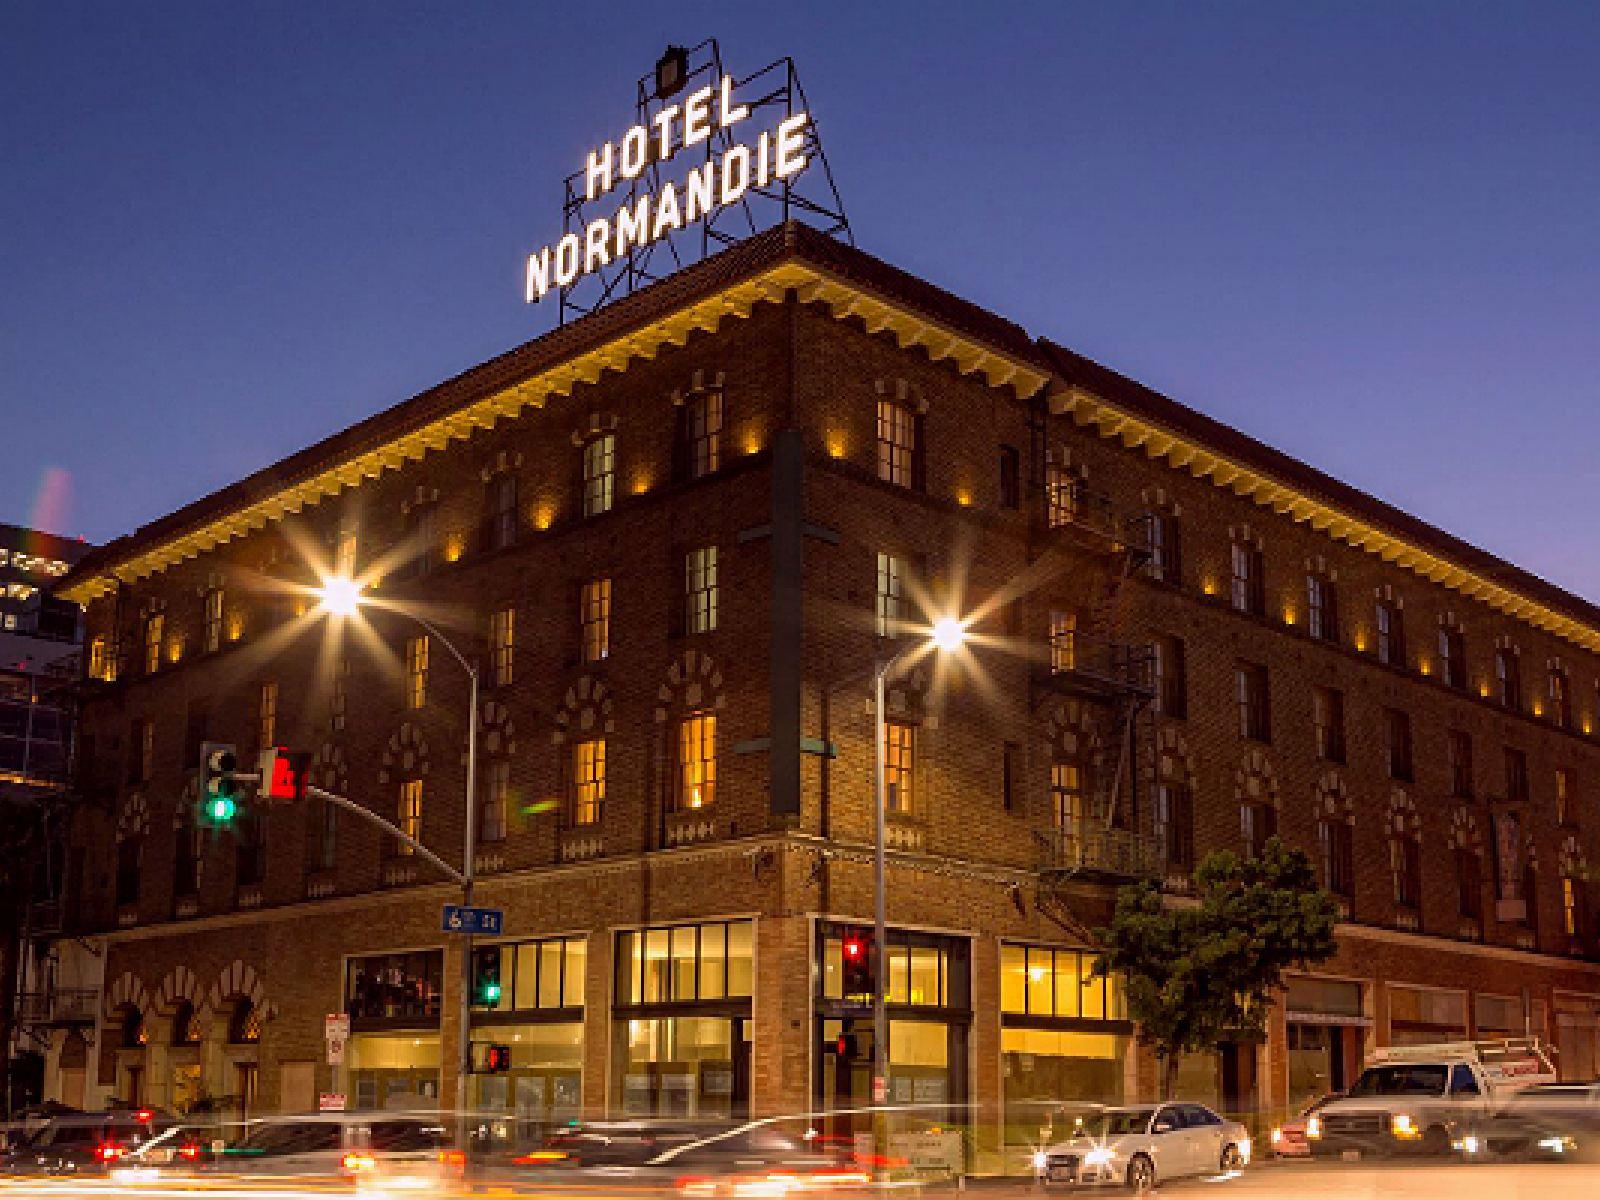 Main image for article titled ハリウッド黄金期の名残が残る老舗ホテル Hotel Normandie を大特集!